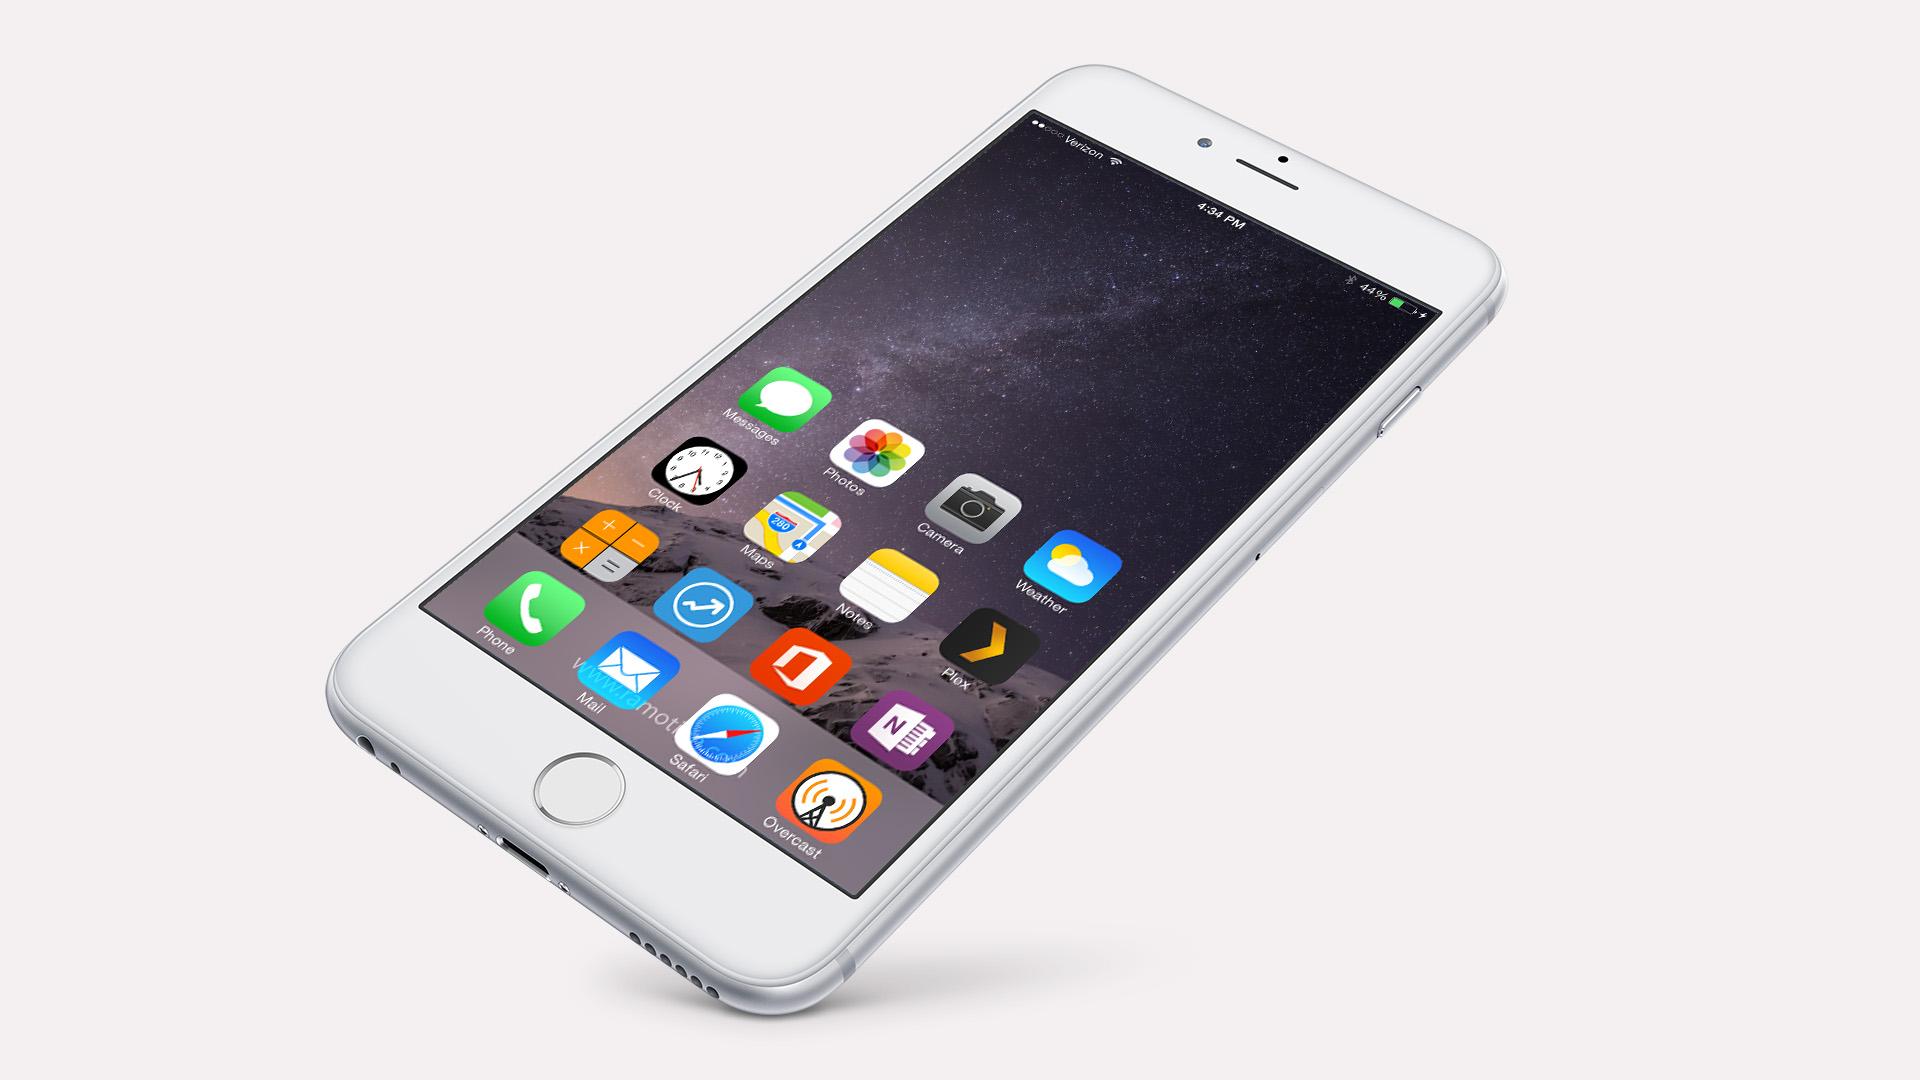 iphone-6-plus-reachability.jpg